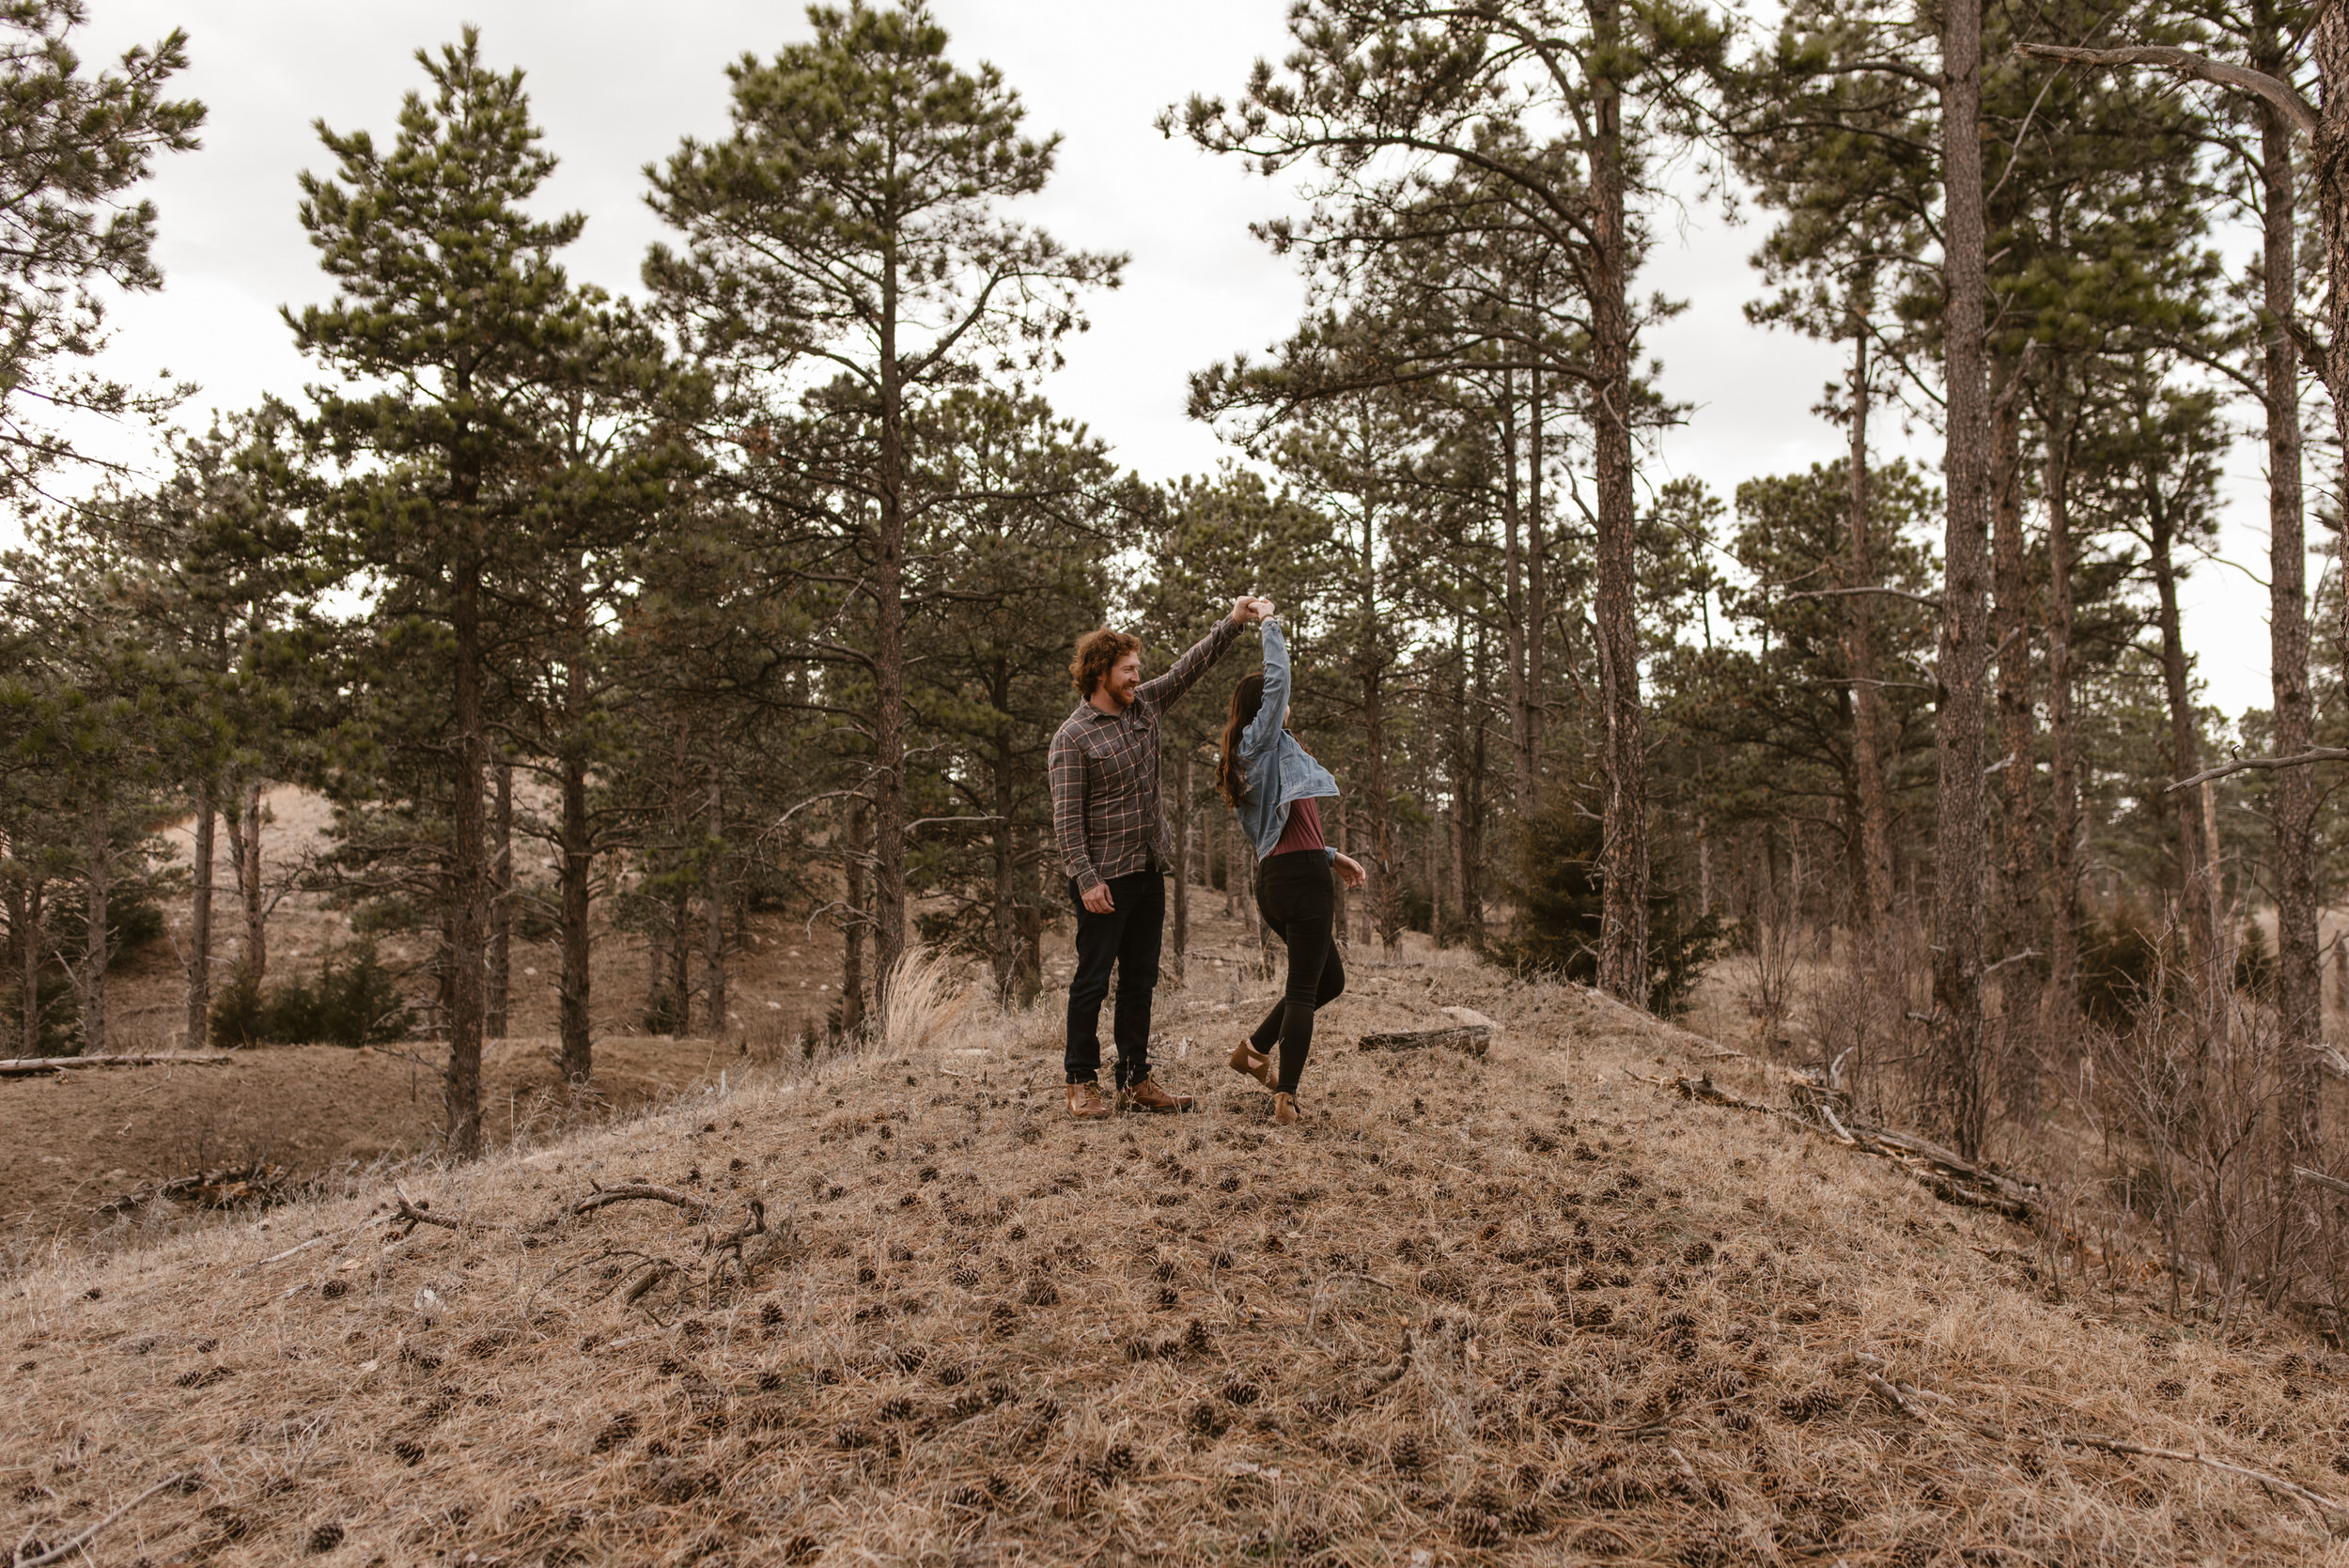 Nebraska-Engagement-Session-Halsey-Forest-Kaylie-Sirek-Photography-013.jpg